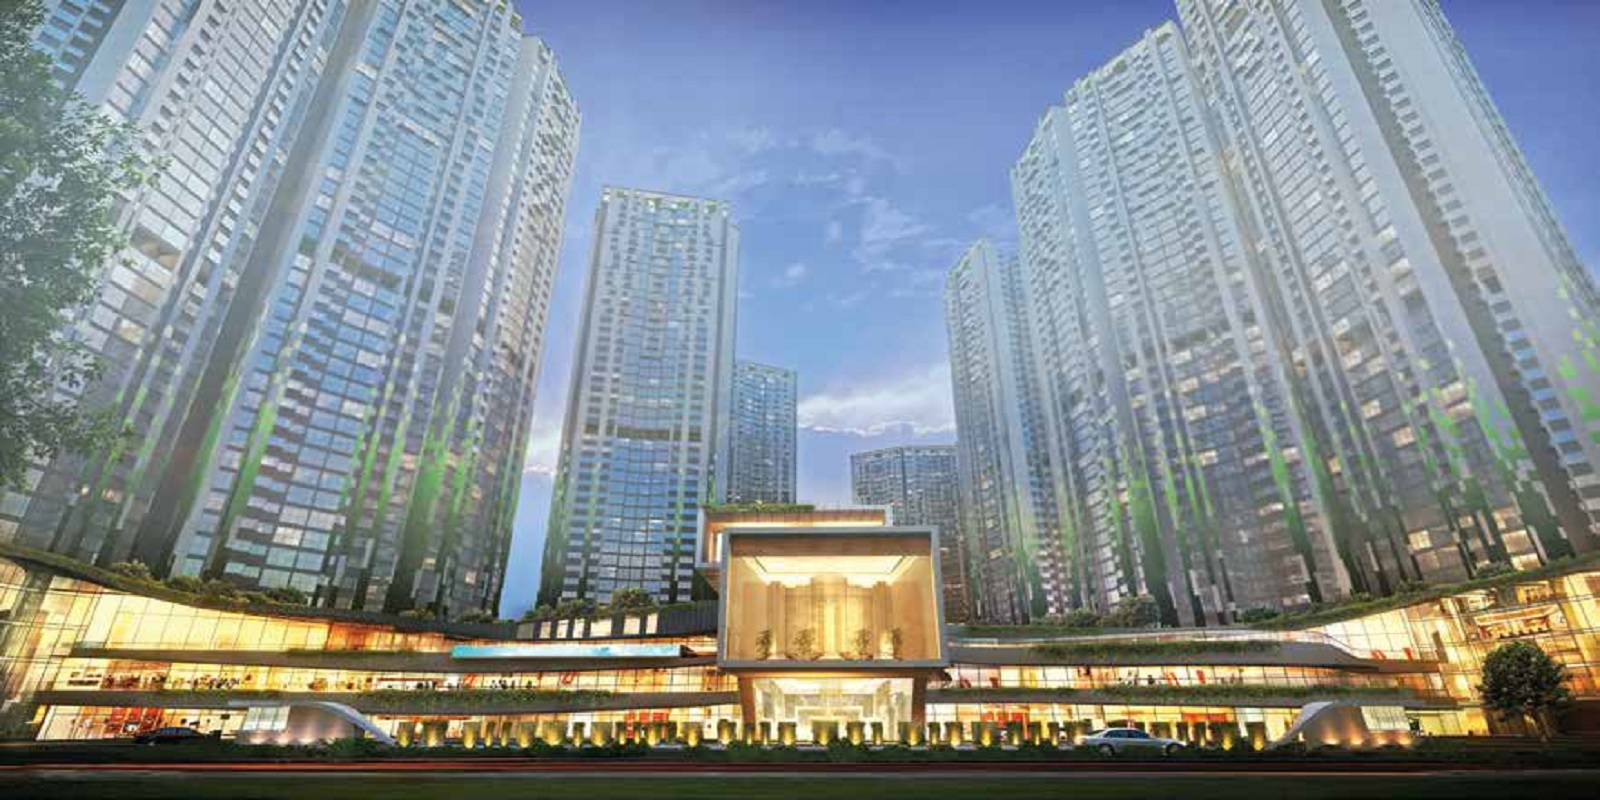 adhiraj samyama tower 1c project large image2